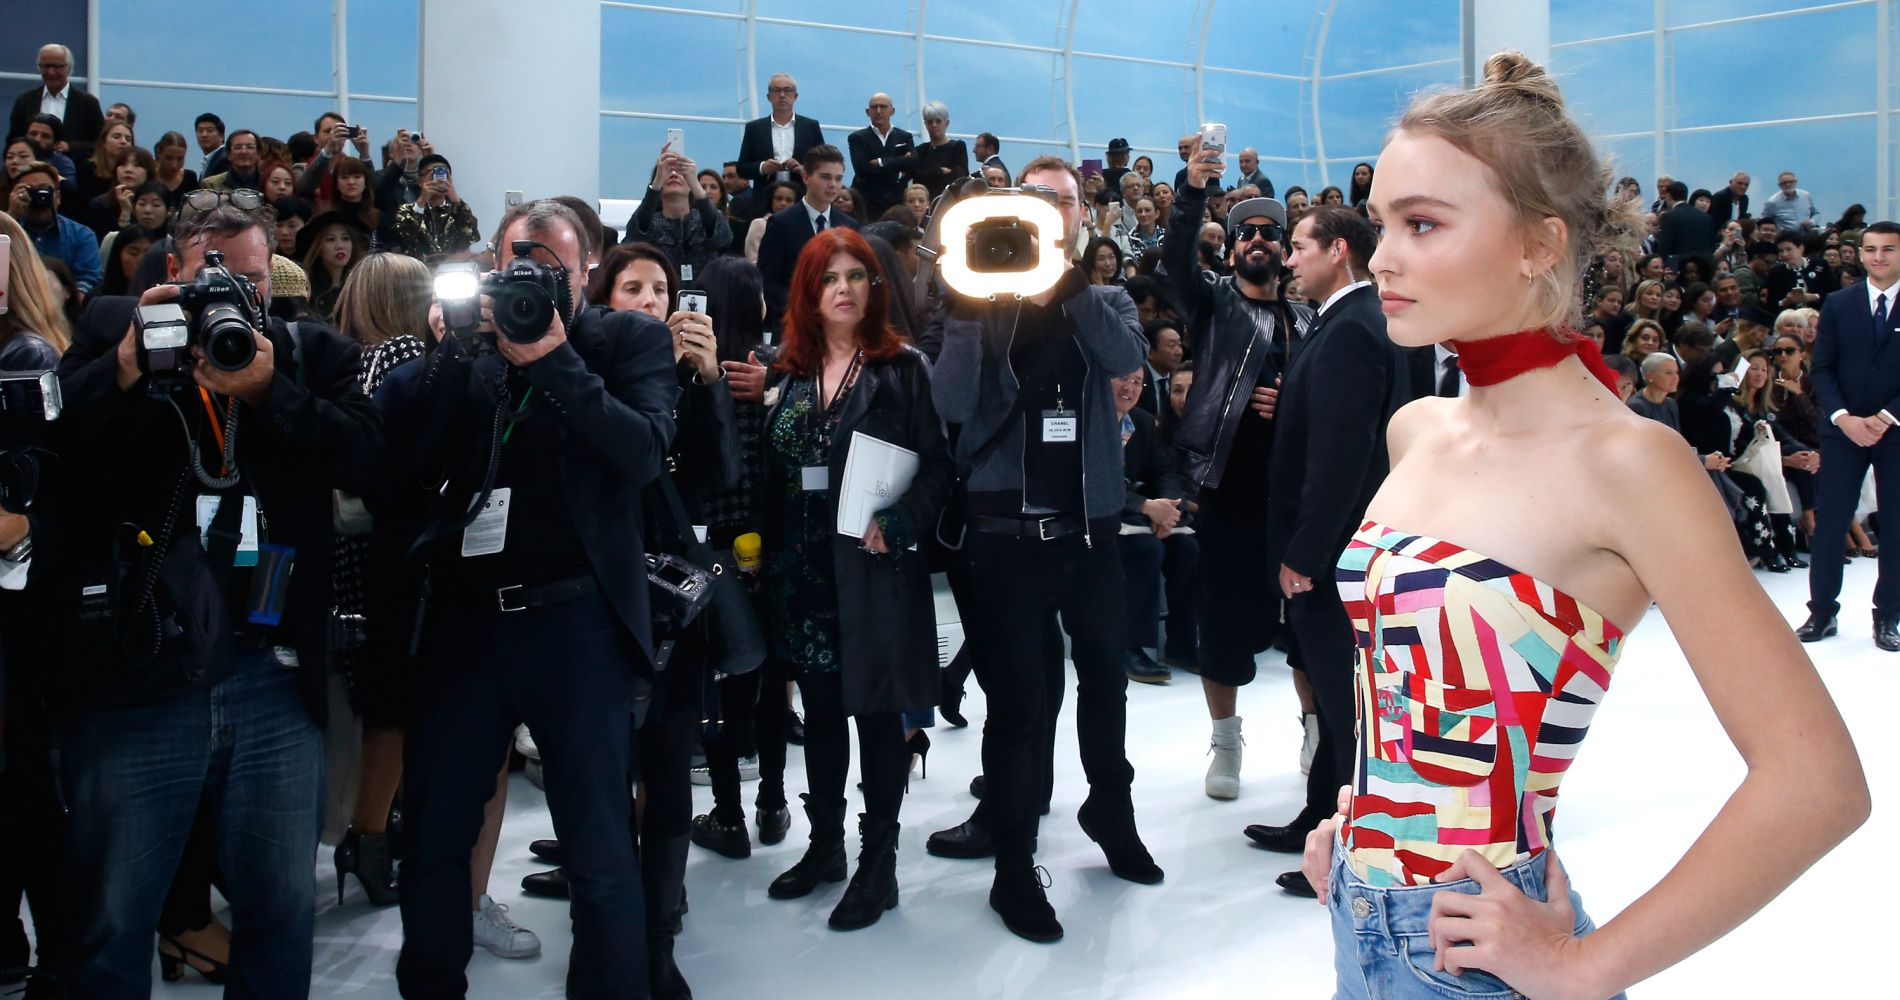 Marie-Ange Casta, Virginie Ledoyen, Maria Sharapova : toutes chez Chanel